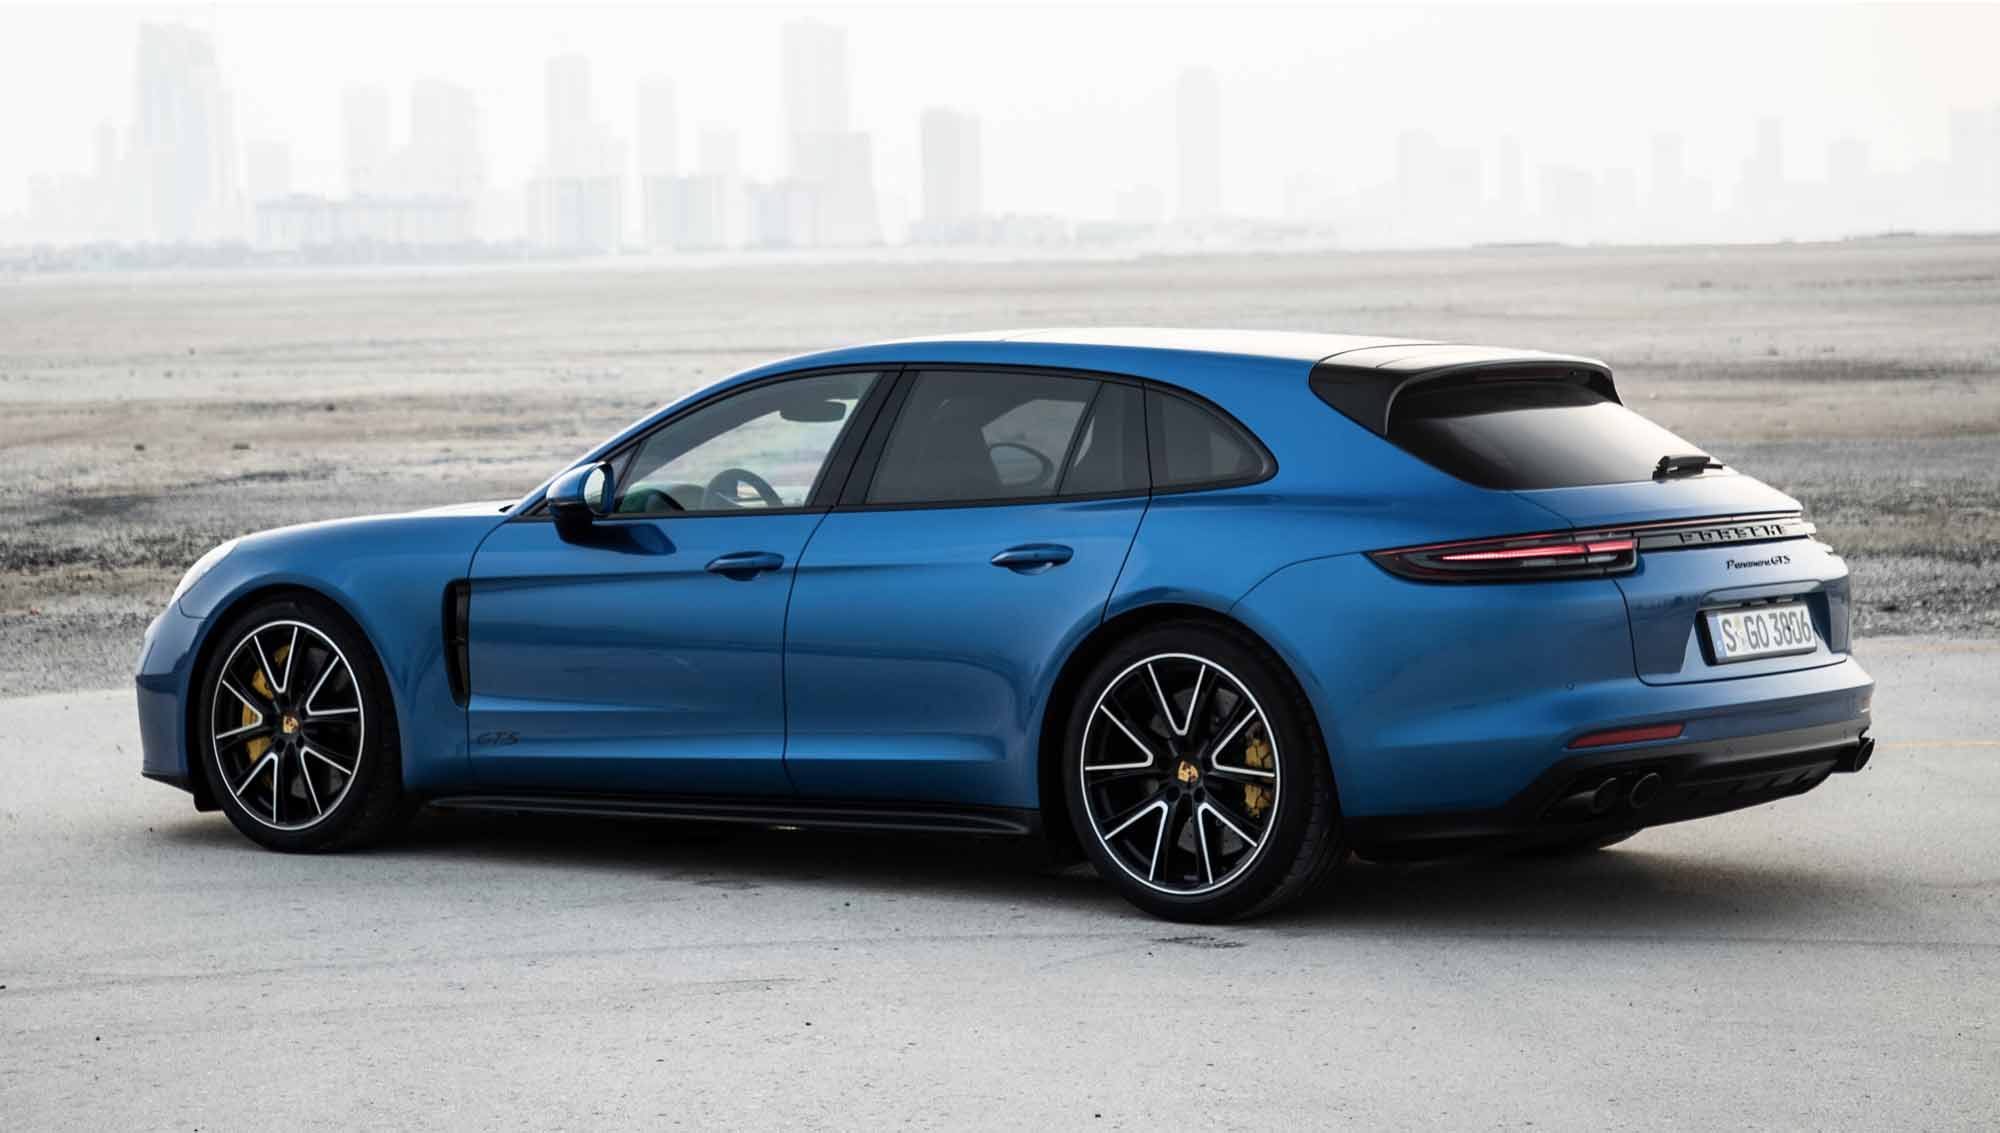 La nuova Porsche Panamera 2020